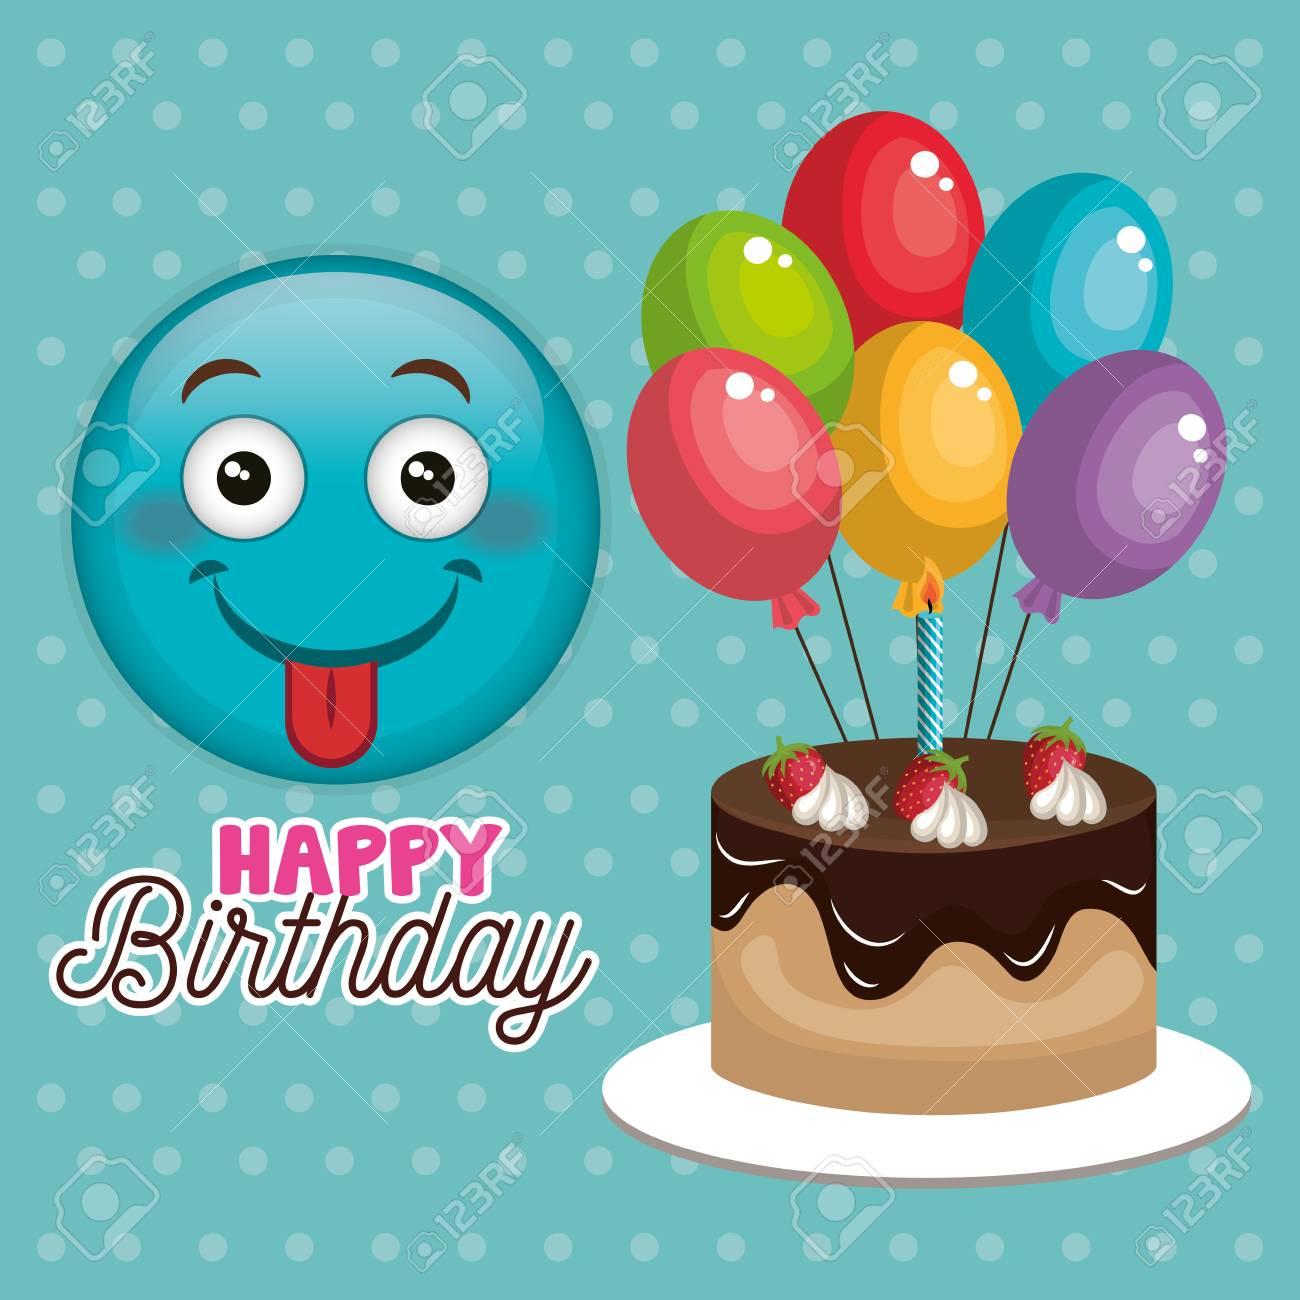 Pleasant A Happy Birthday Card With Emoticon Vector Illustration Design Funny Birthday Cards Online Unhofree Goldxyz